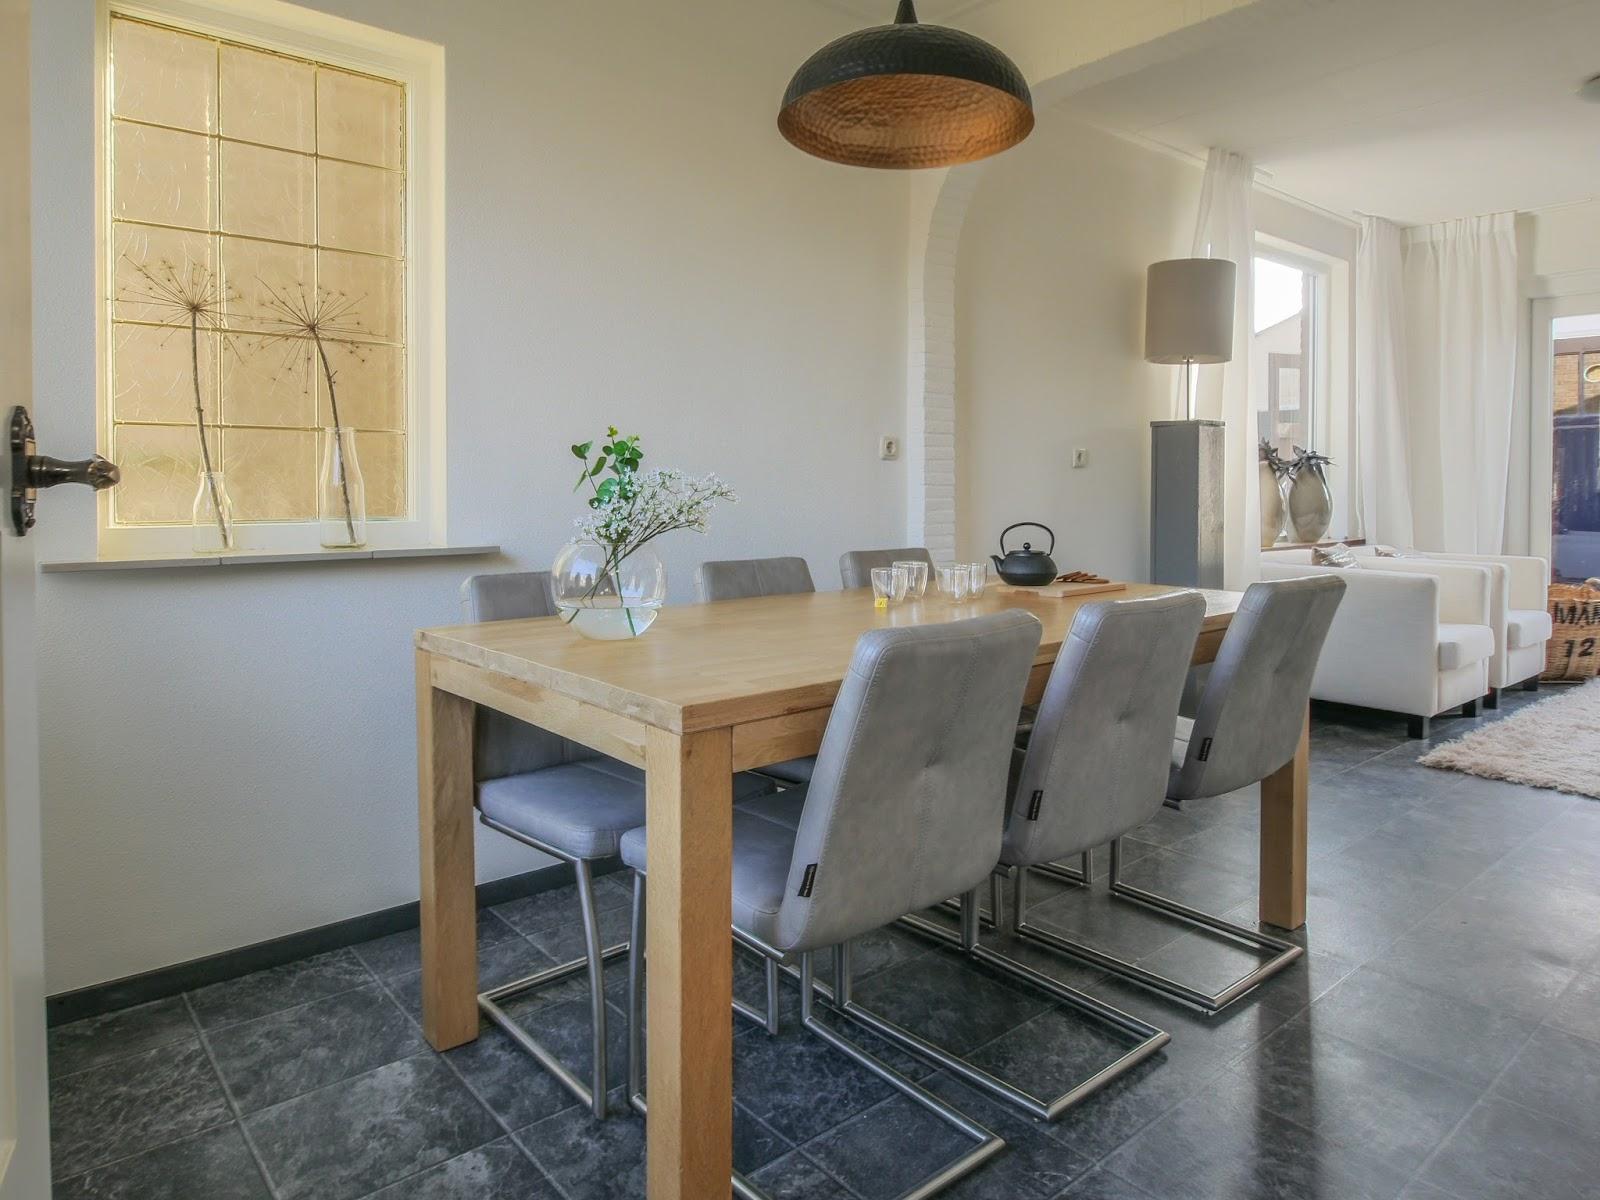 Emejing Ikea Eetkamer Contemporary - New Home Design 2018 ...